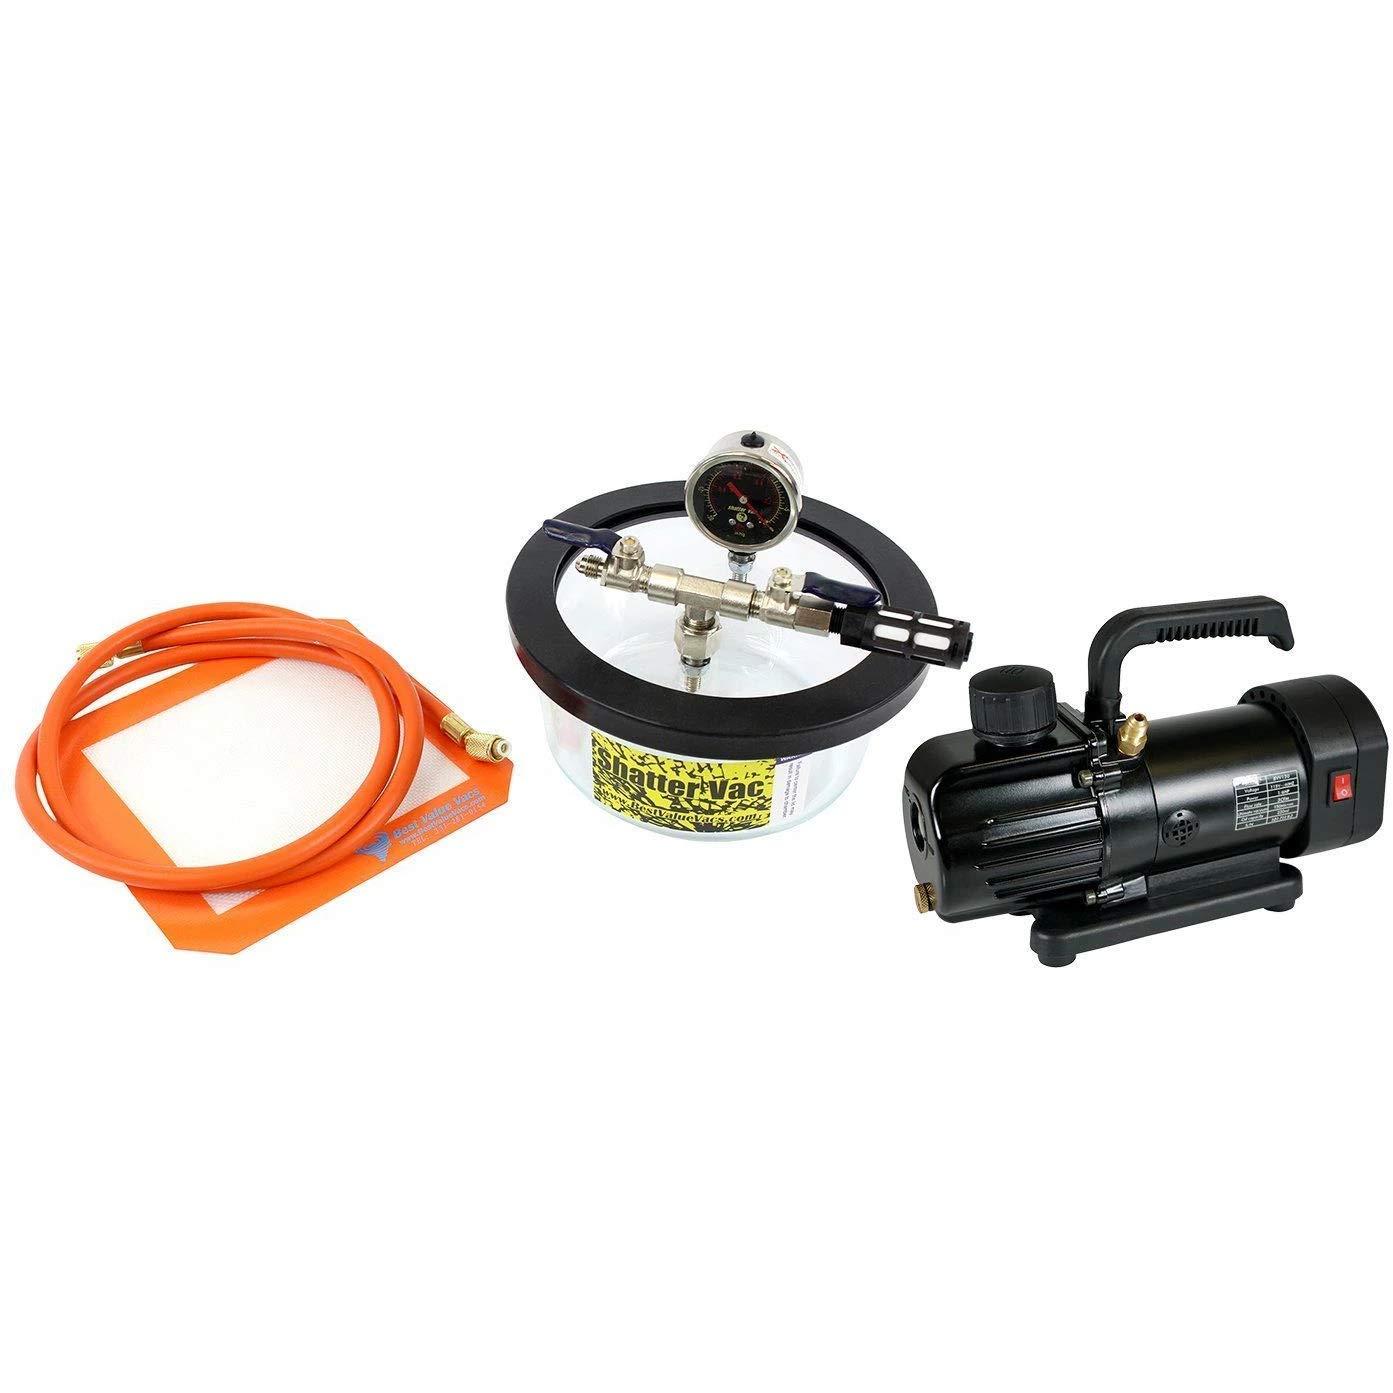 SVac 1.75 Quart Pyrex Vacuum Chamber and BVV130 Mini 3CFM Single Stage Vacuum Pump Kit